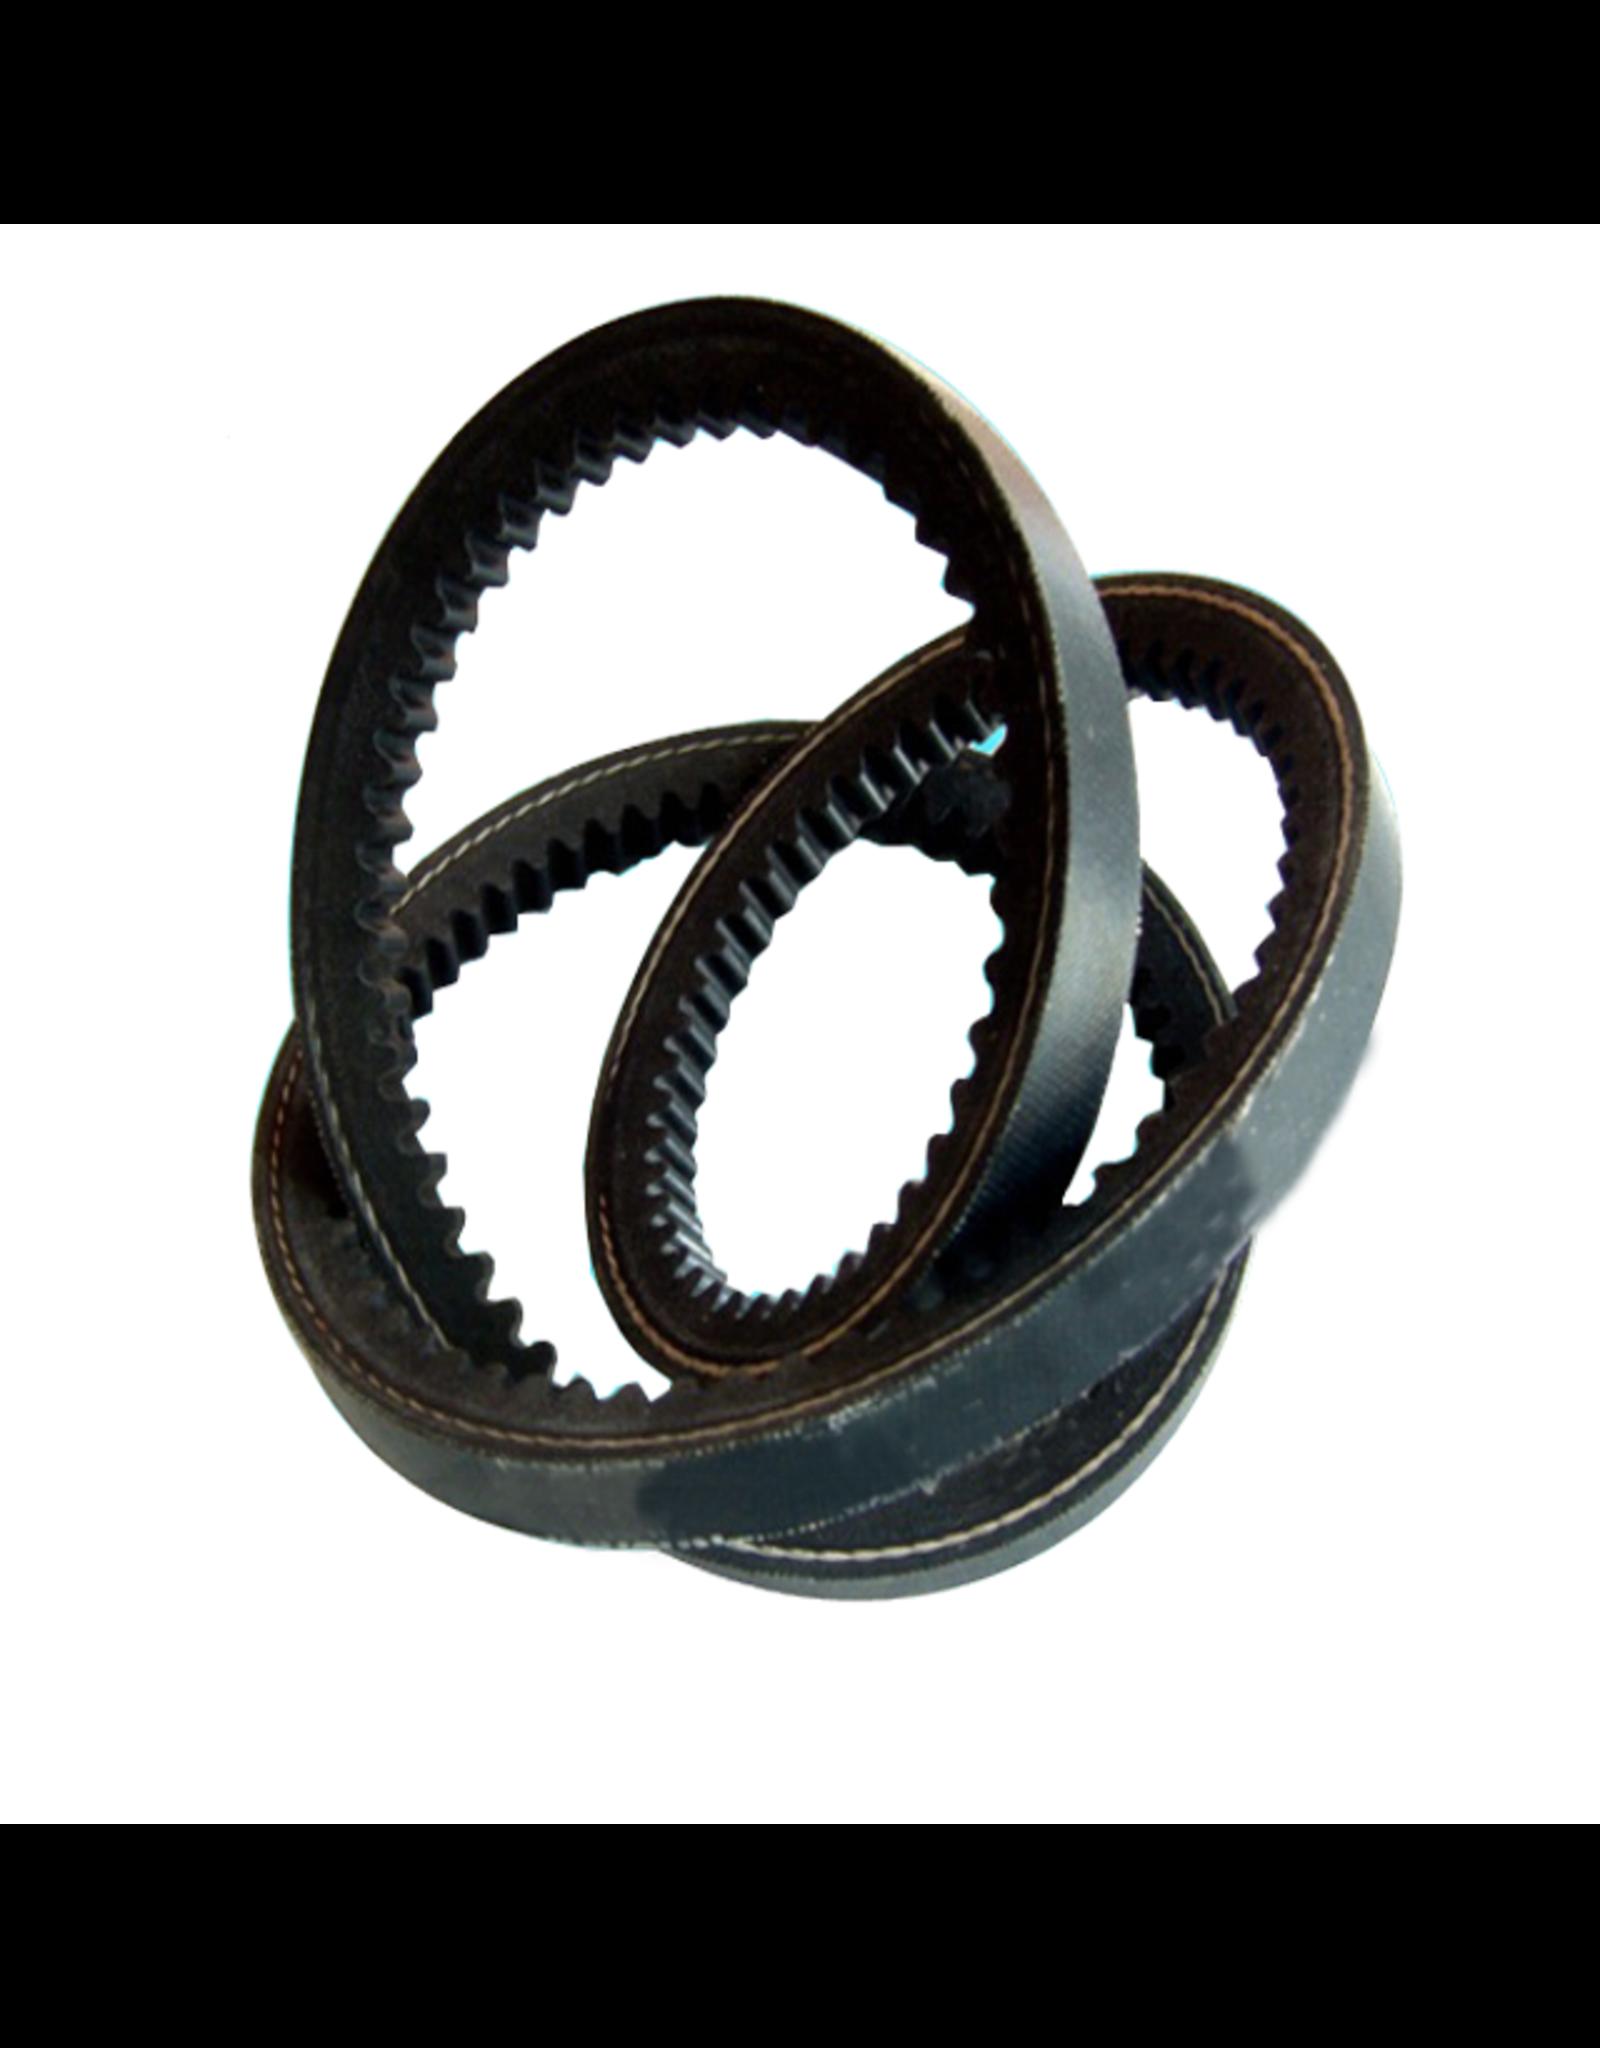 Keilriemen, gezahnt 15 mm